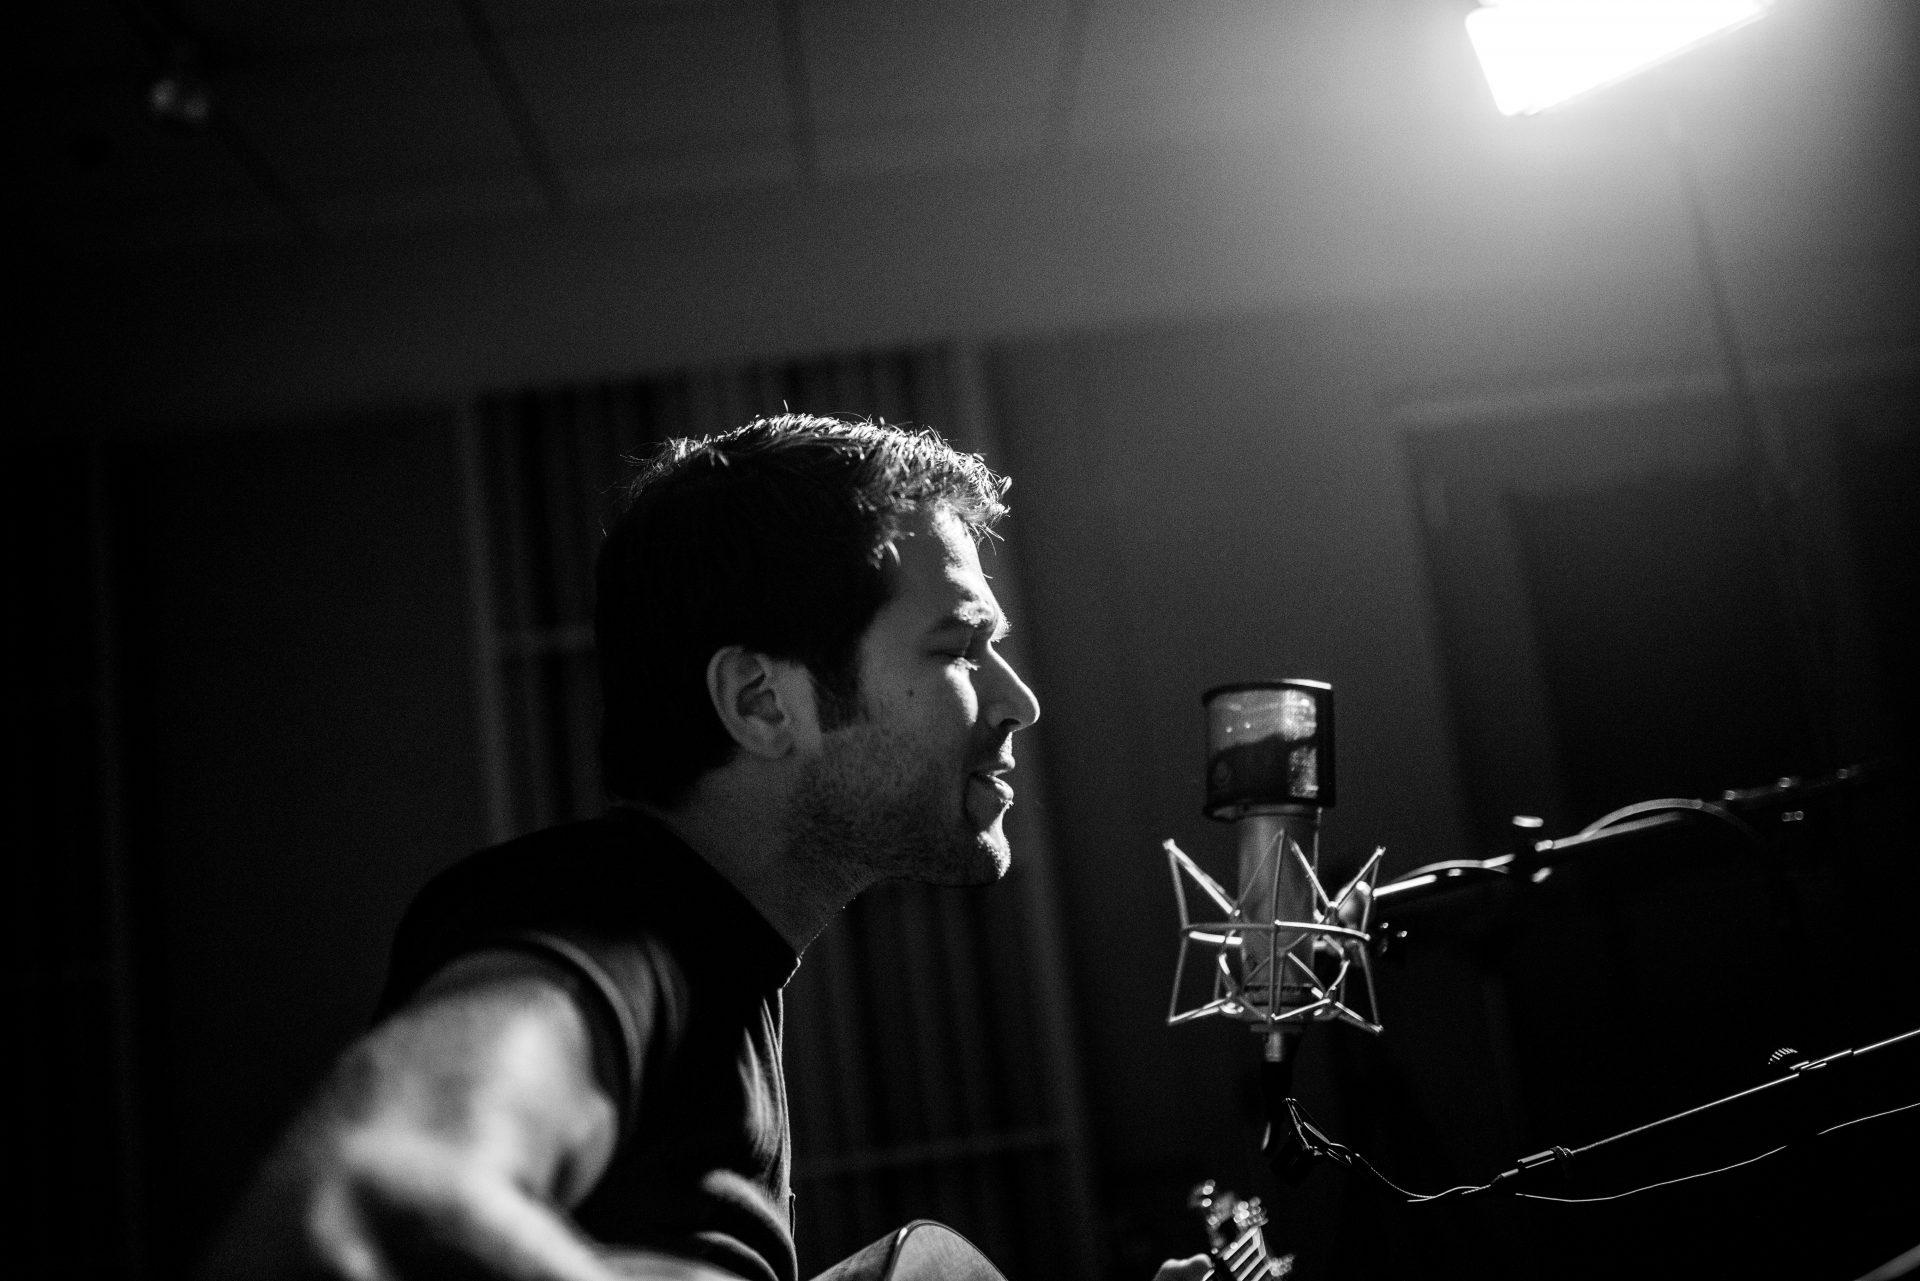 Ben Gallaher sings.